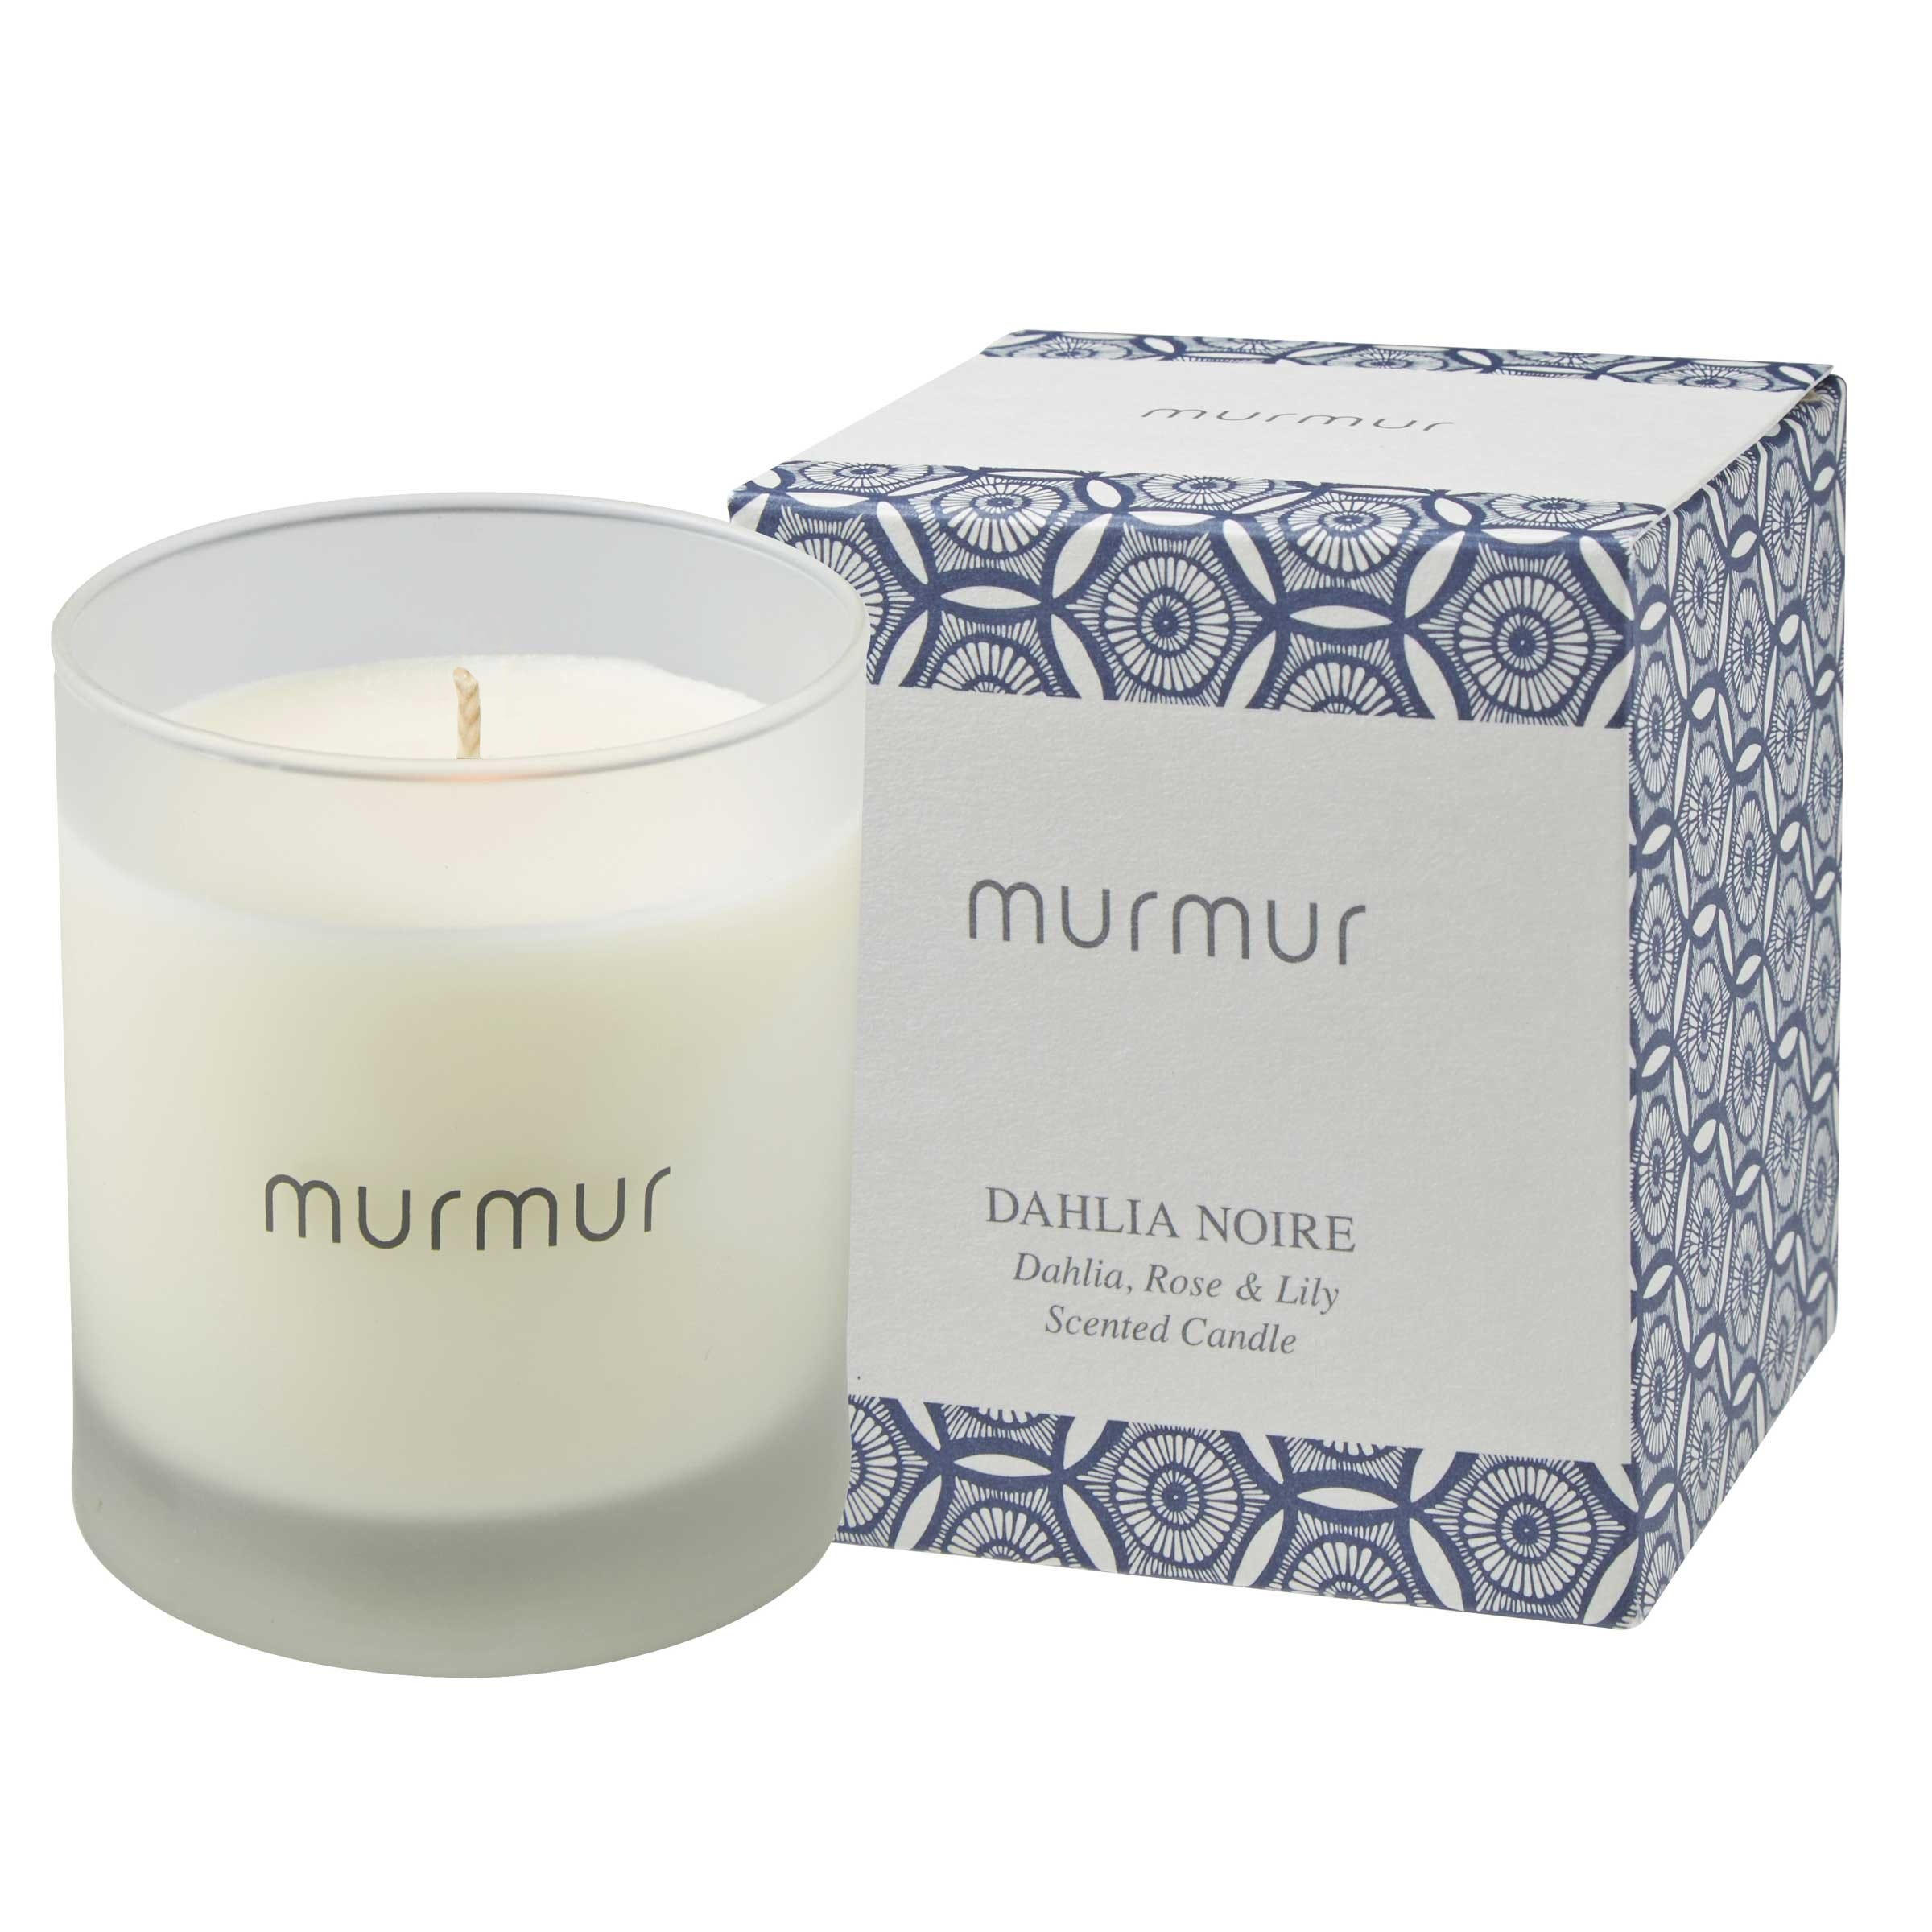 Murmur Dahlia Noire Scented Candle (1 wick)